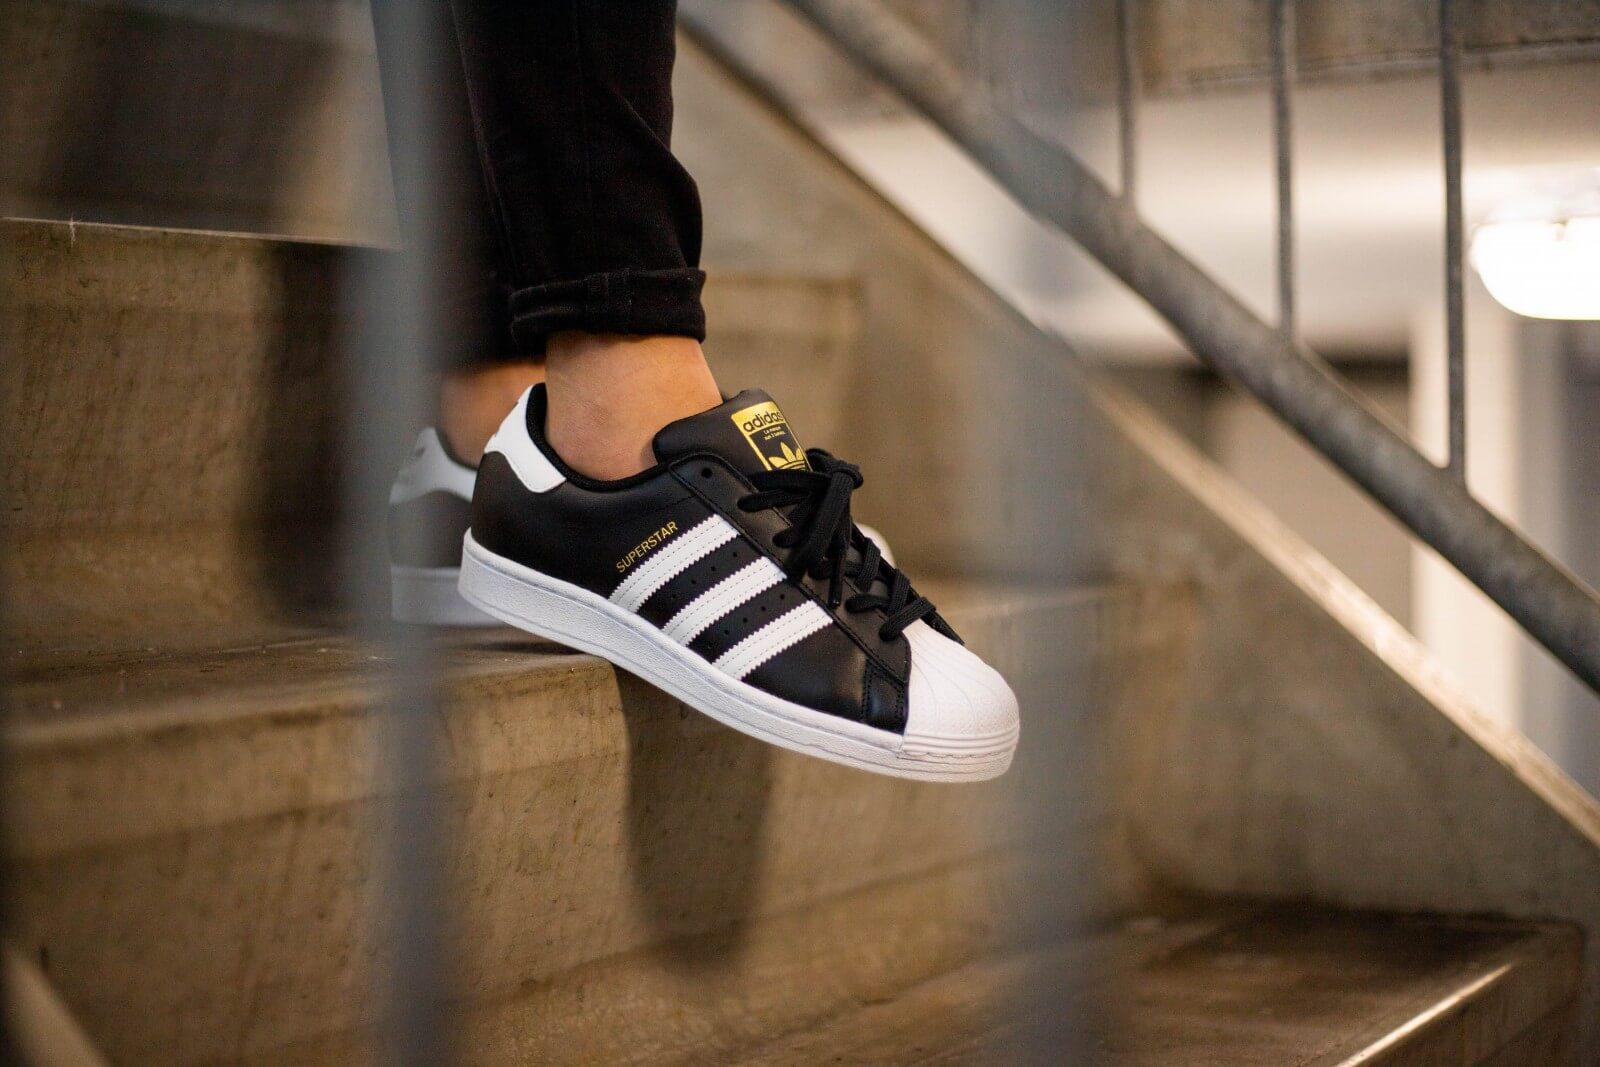 Adidas Women's Superstar Core Black/ Footwear White